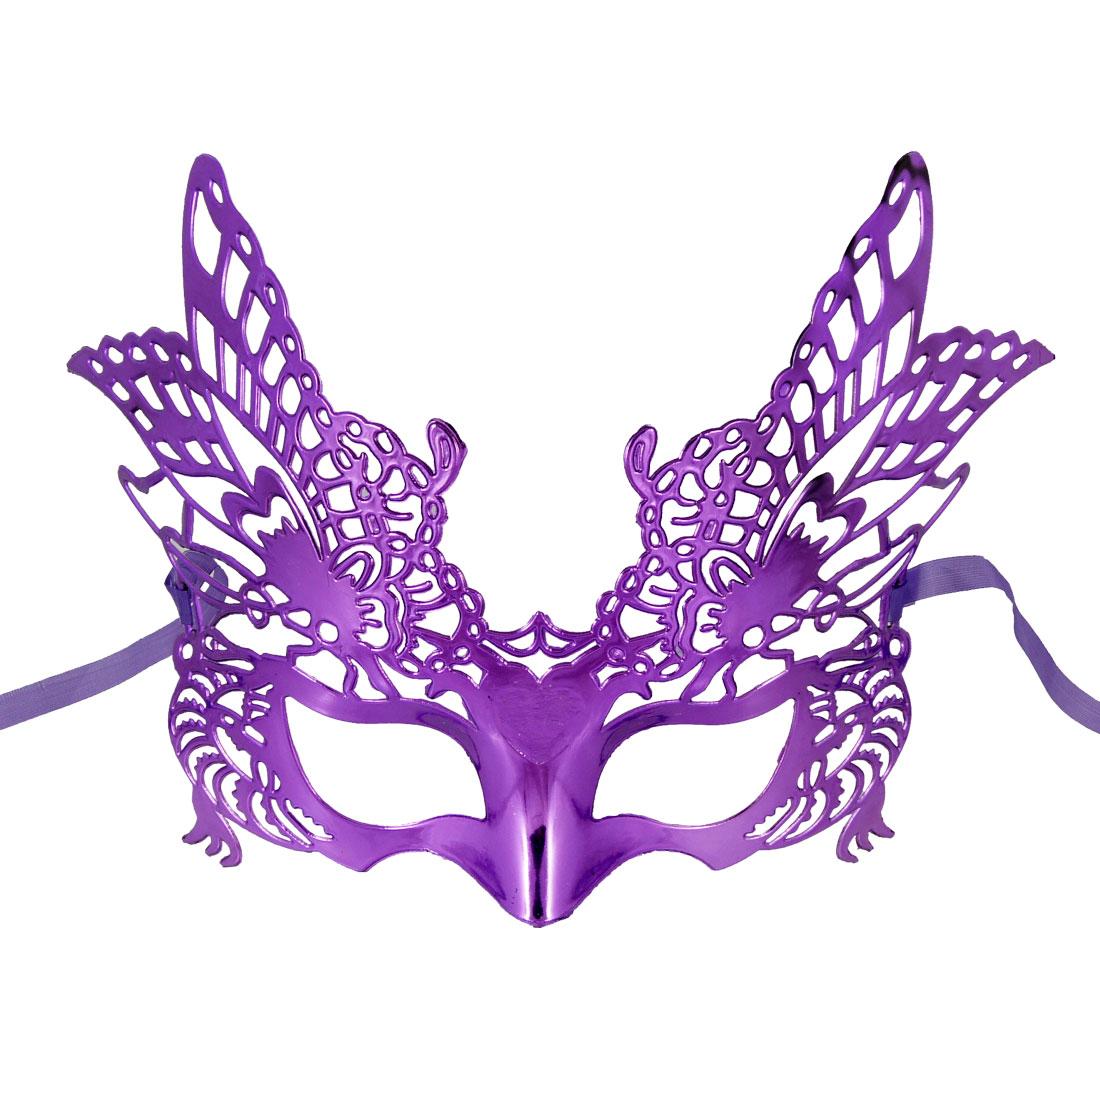 Masquerade Mask Clipart - Cliparts.co